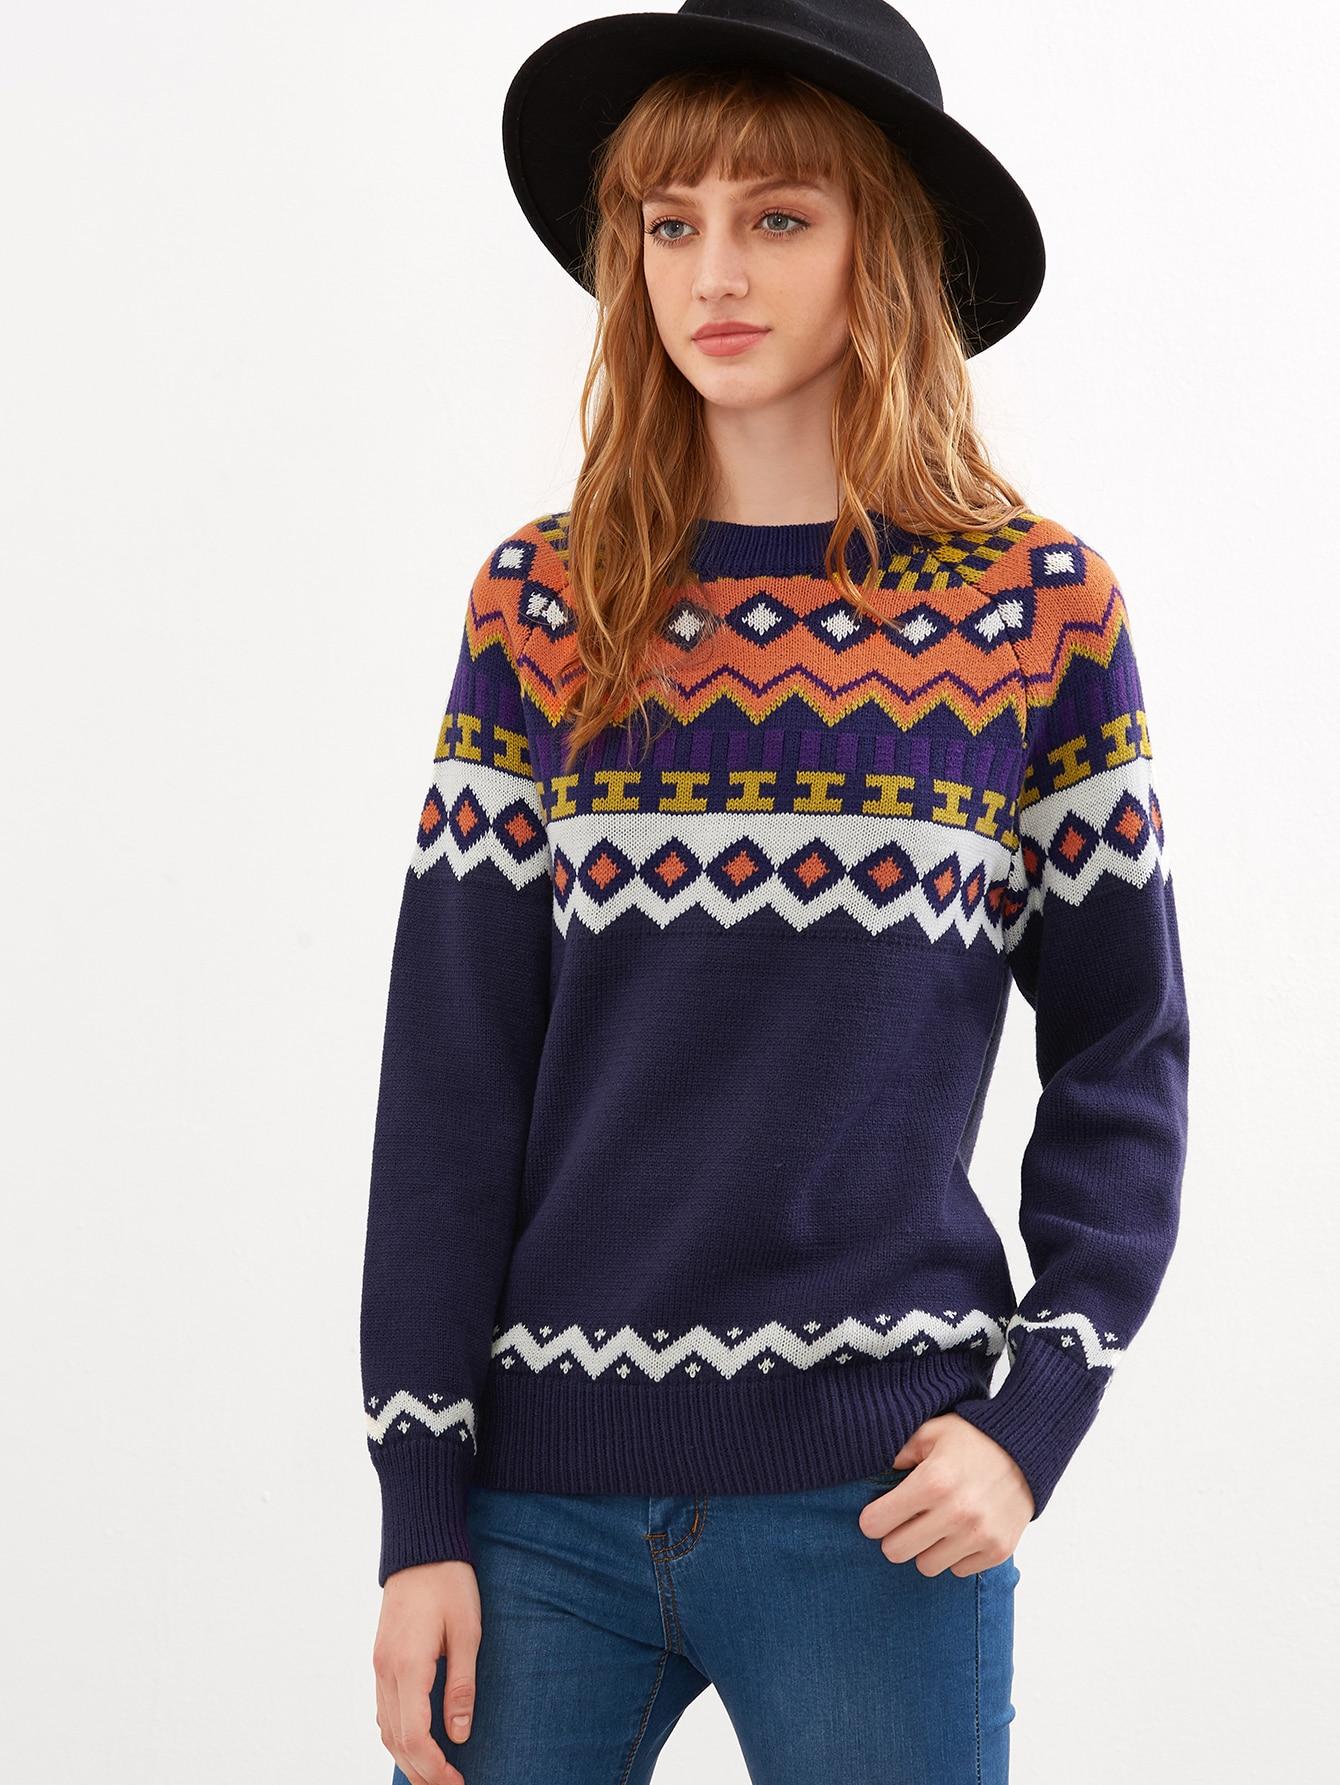 Royal Blue Geometric Pattern Ribbed Trim Sweater sweater160915464